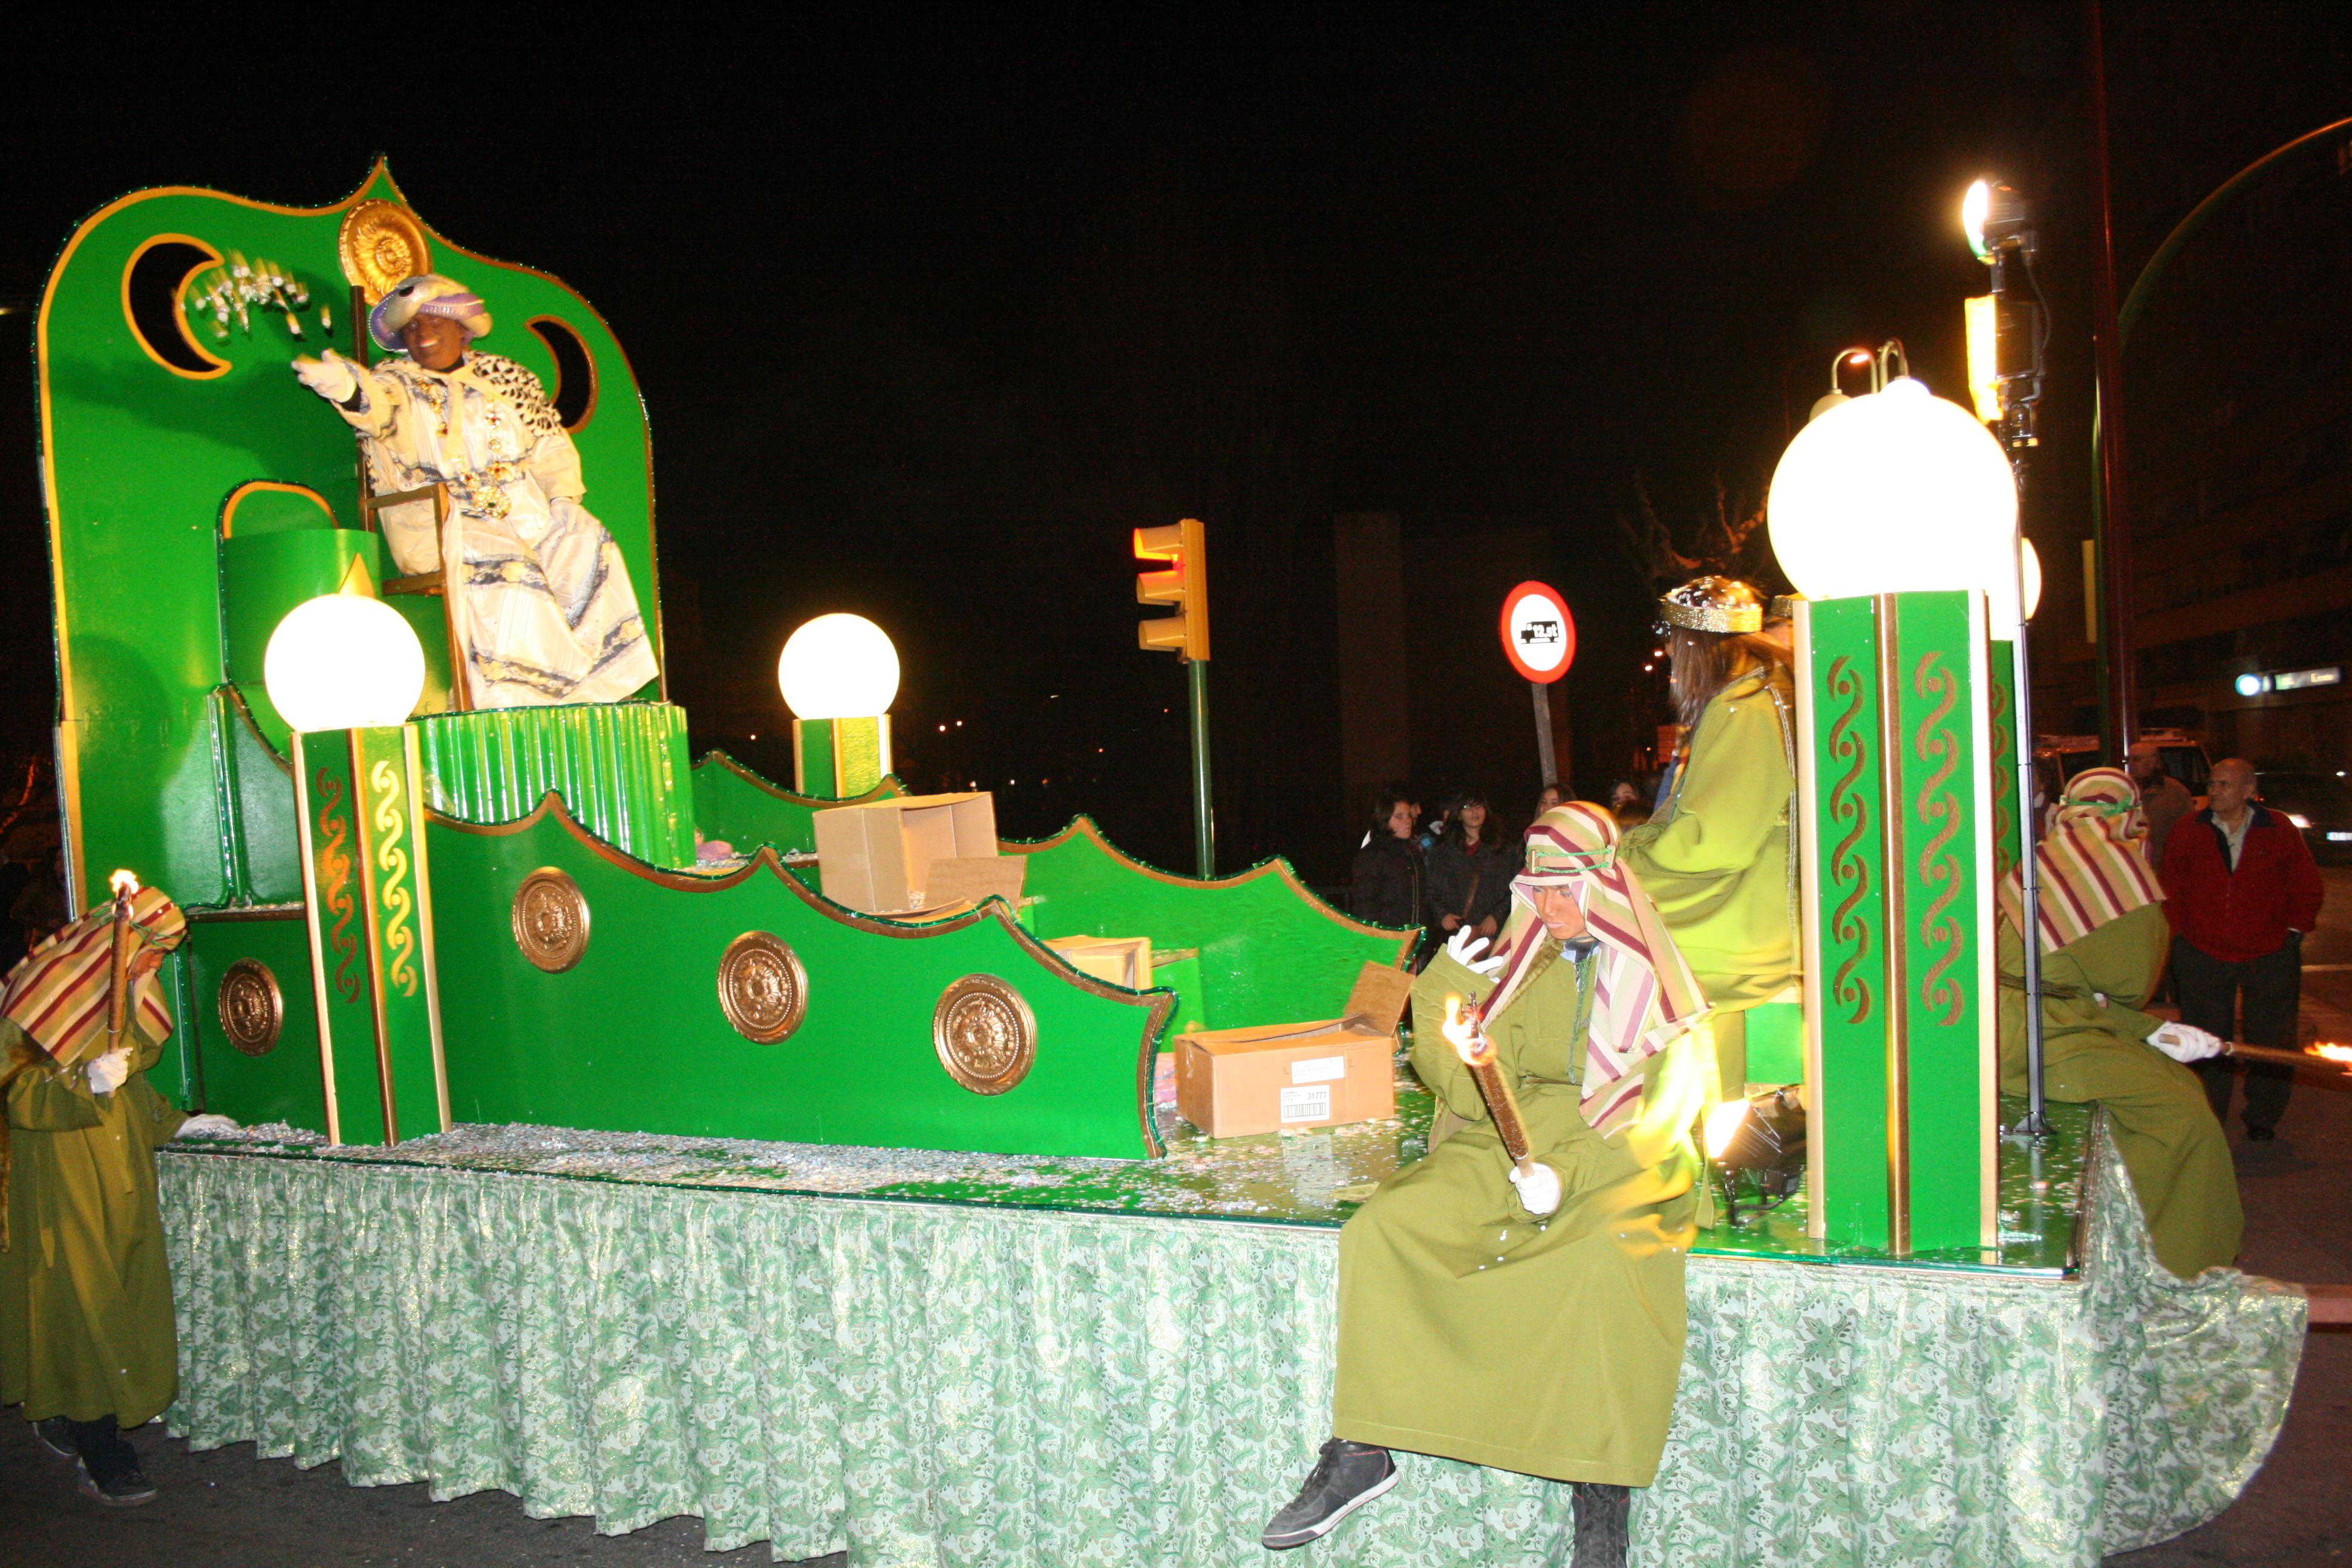 Cabalgata Fotos.File Cabalgata De Reyes Calatayud Espana19 Jpg Wikimedia